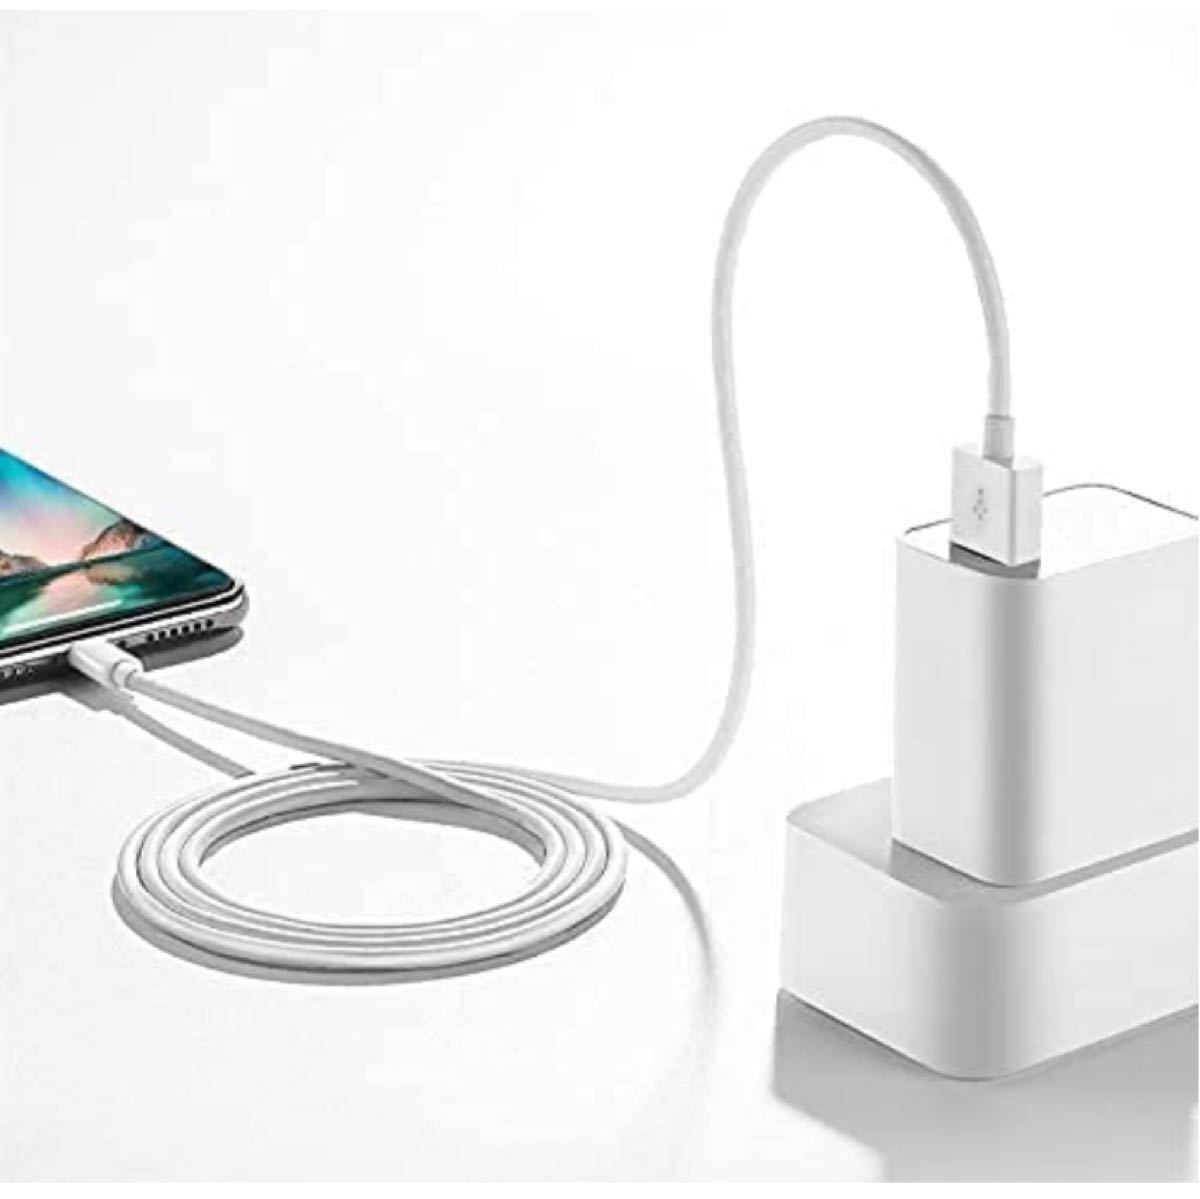 iPhone充電ケーブル 急速充電 ライトニングUSBケーブル 高速データ転送 iPhone/iPad/iPod 対応 充電器